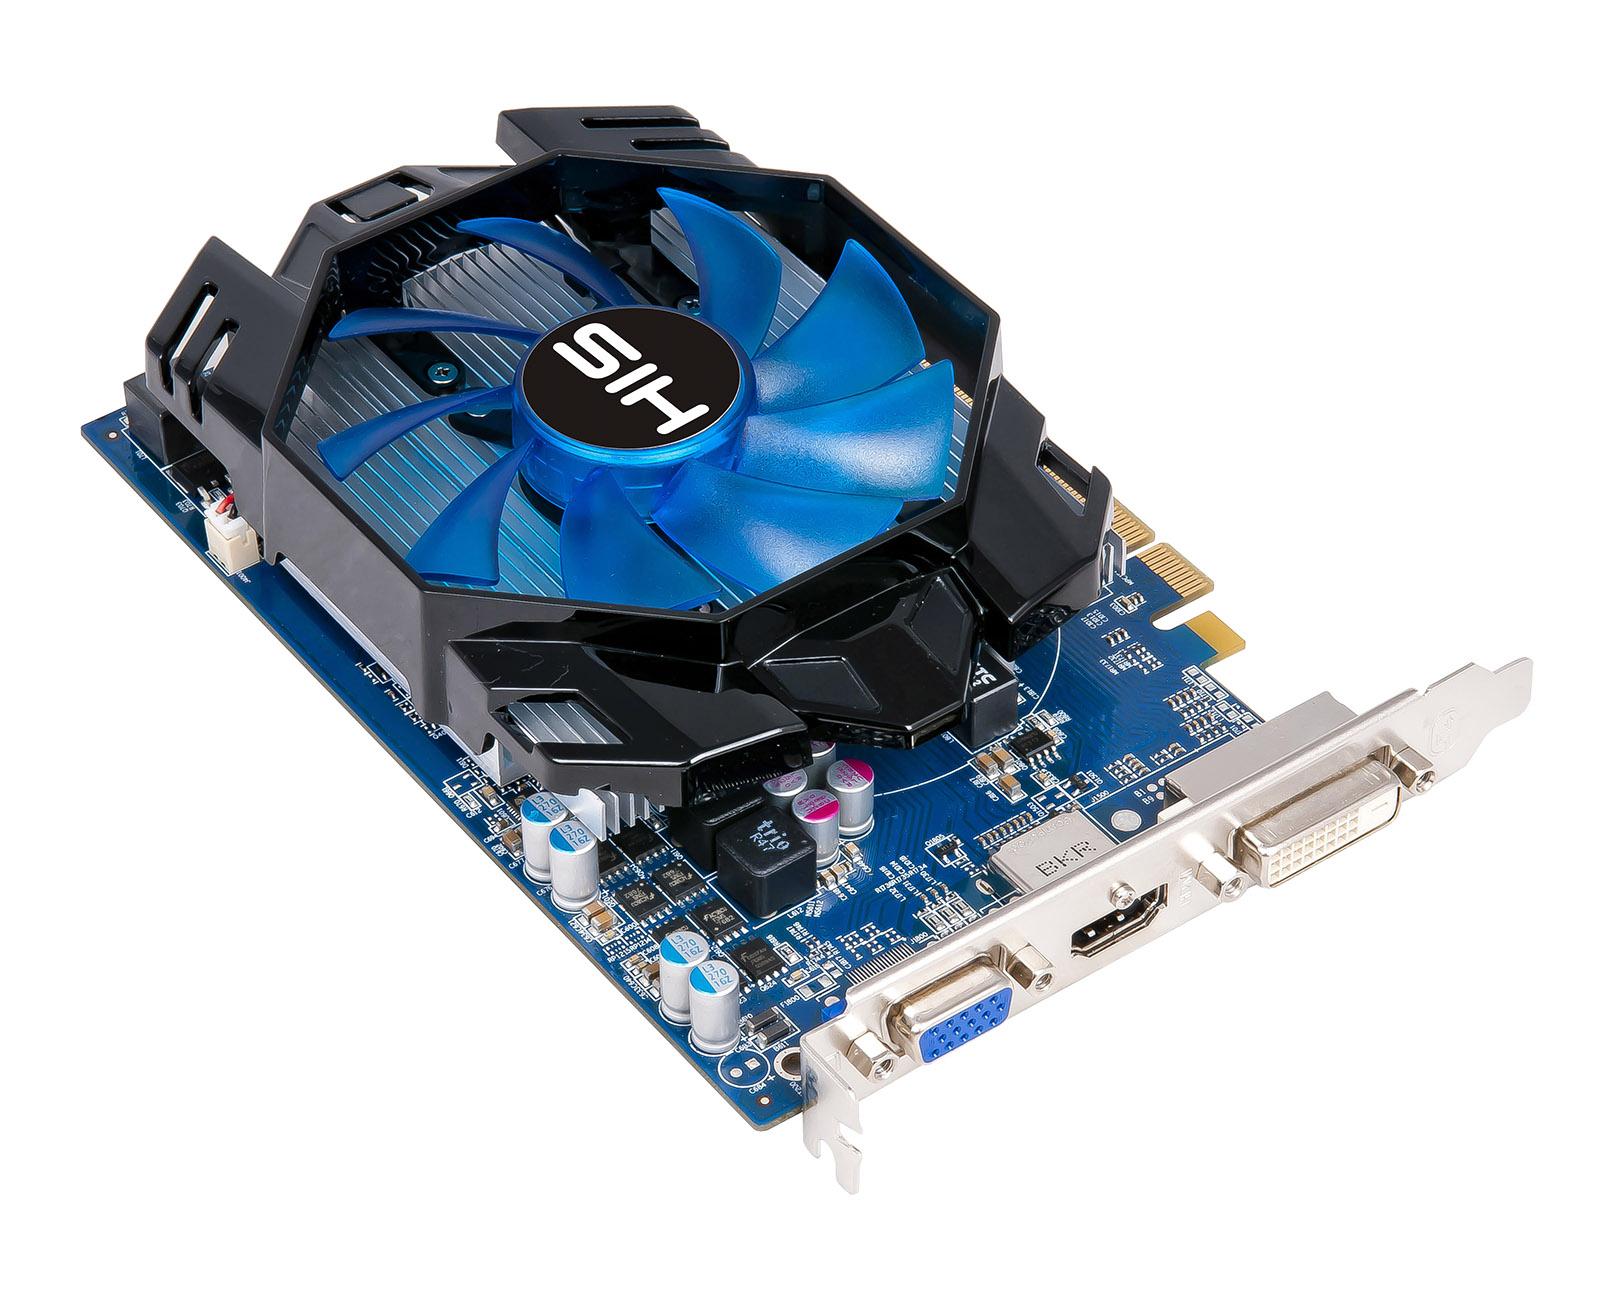 R7 250X iCooler 1GB GDDR5 PCI-E DLDVI-D/HDMI/VGA < R7 250